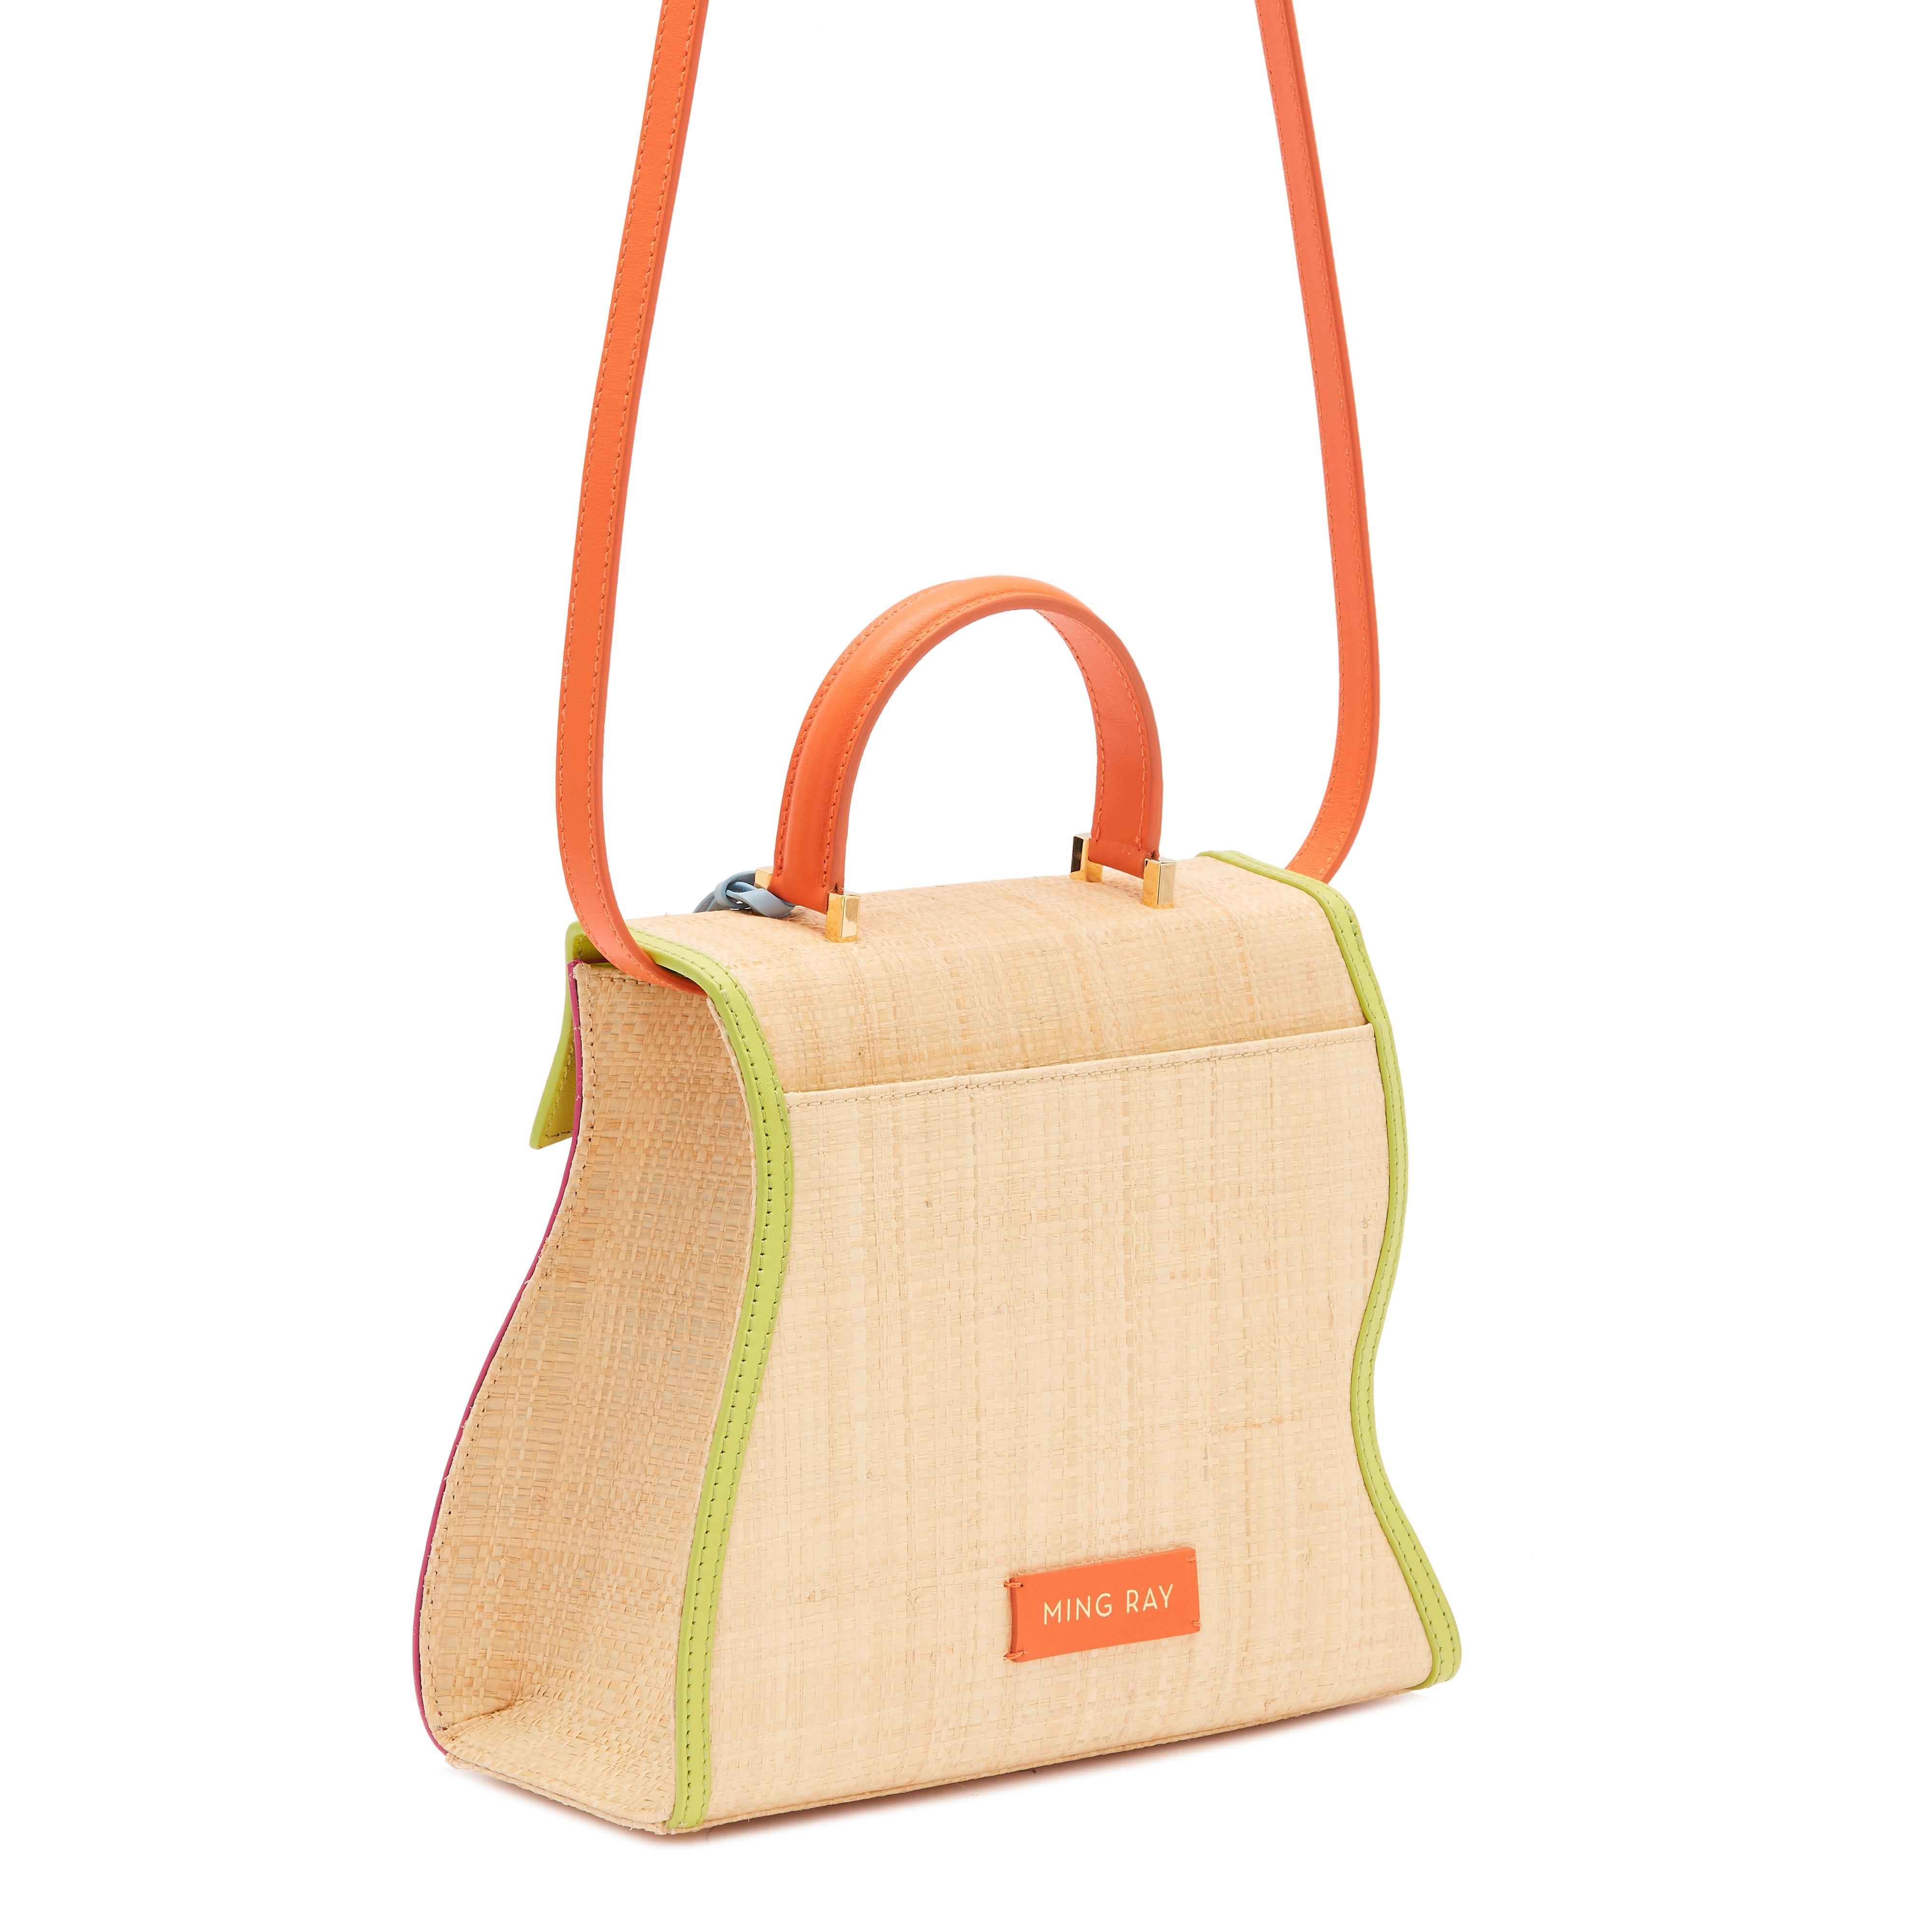 ming ray | Bag | LARISSAPARADISE